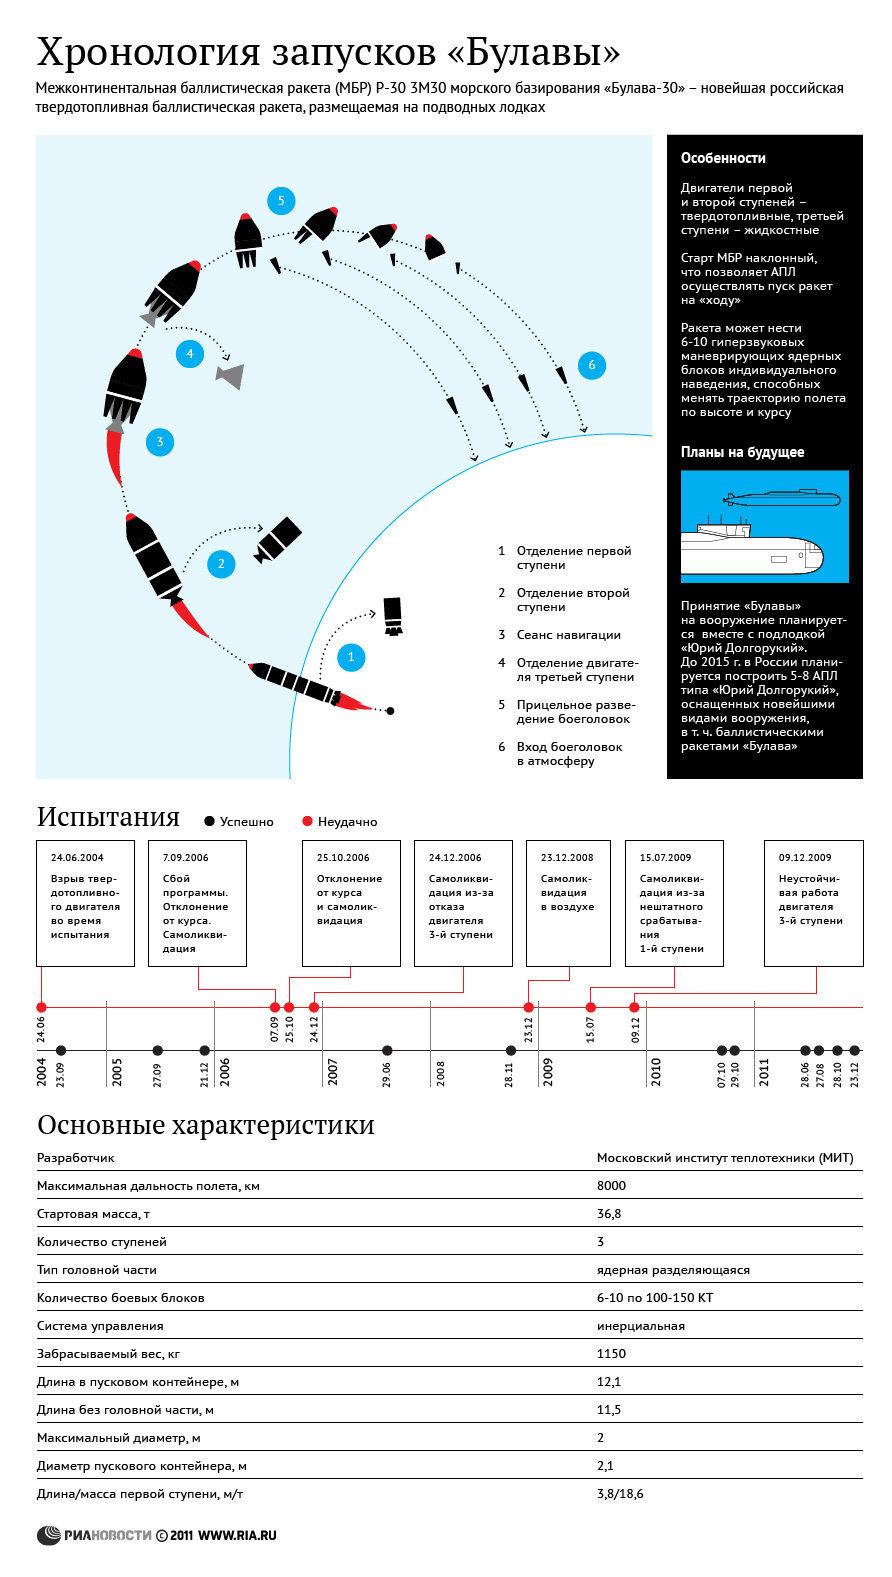 Хронология запусков морских баллистических ракет «Булава»